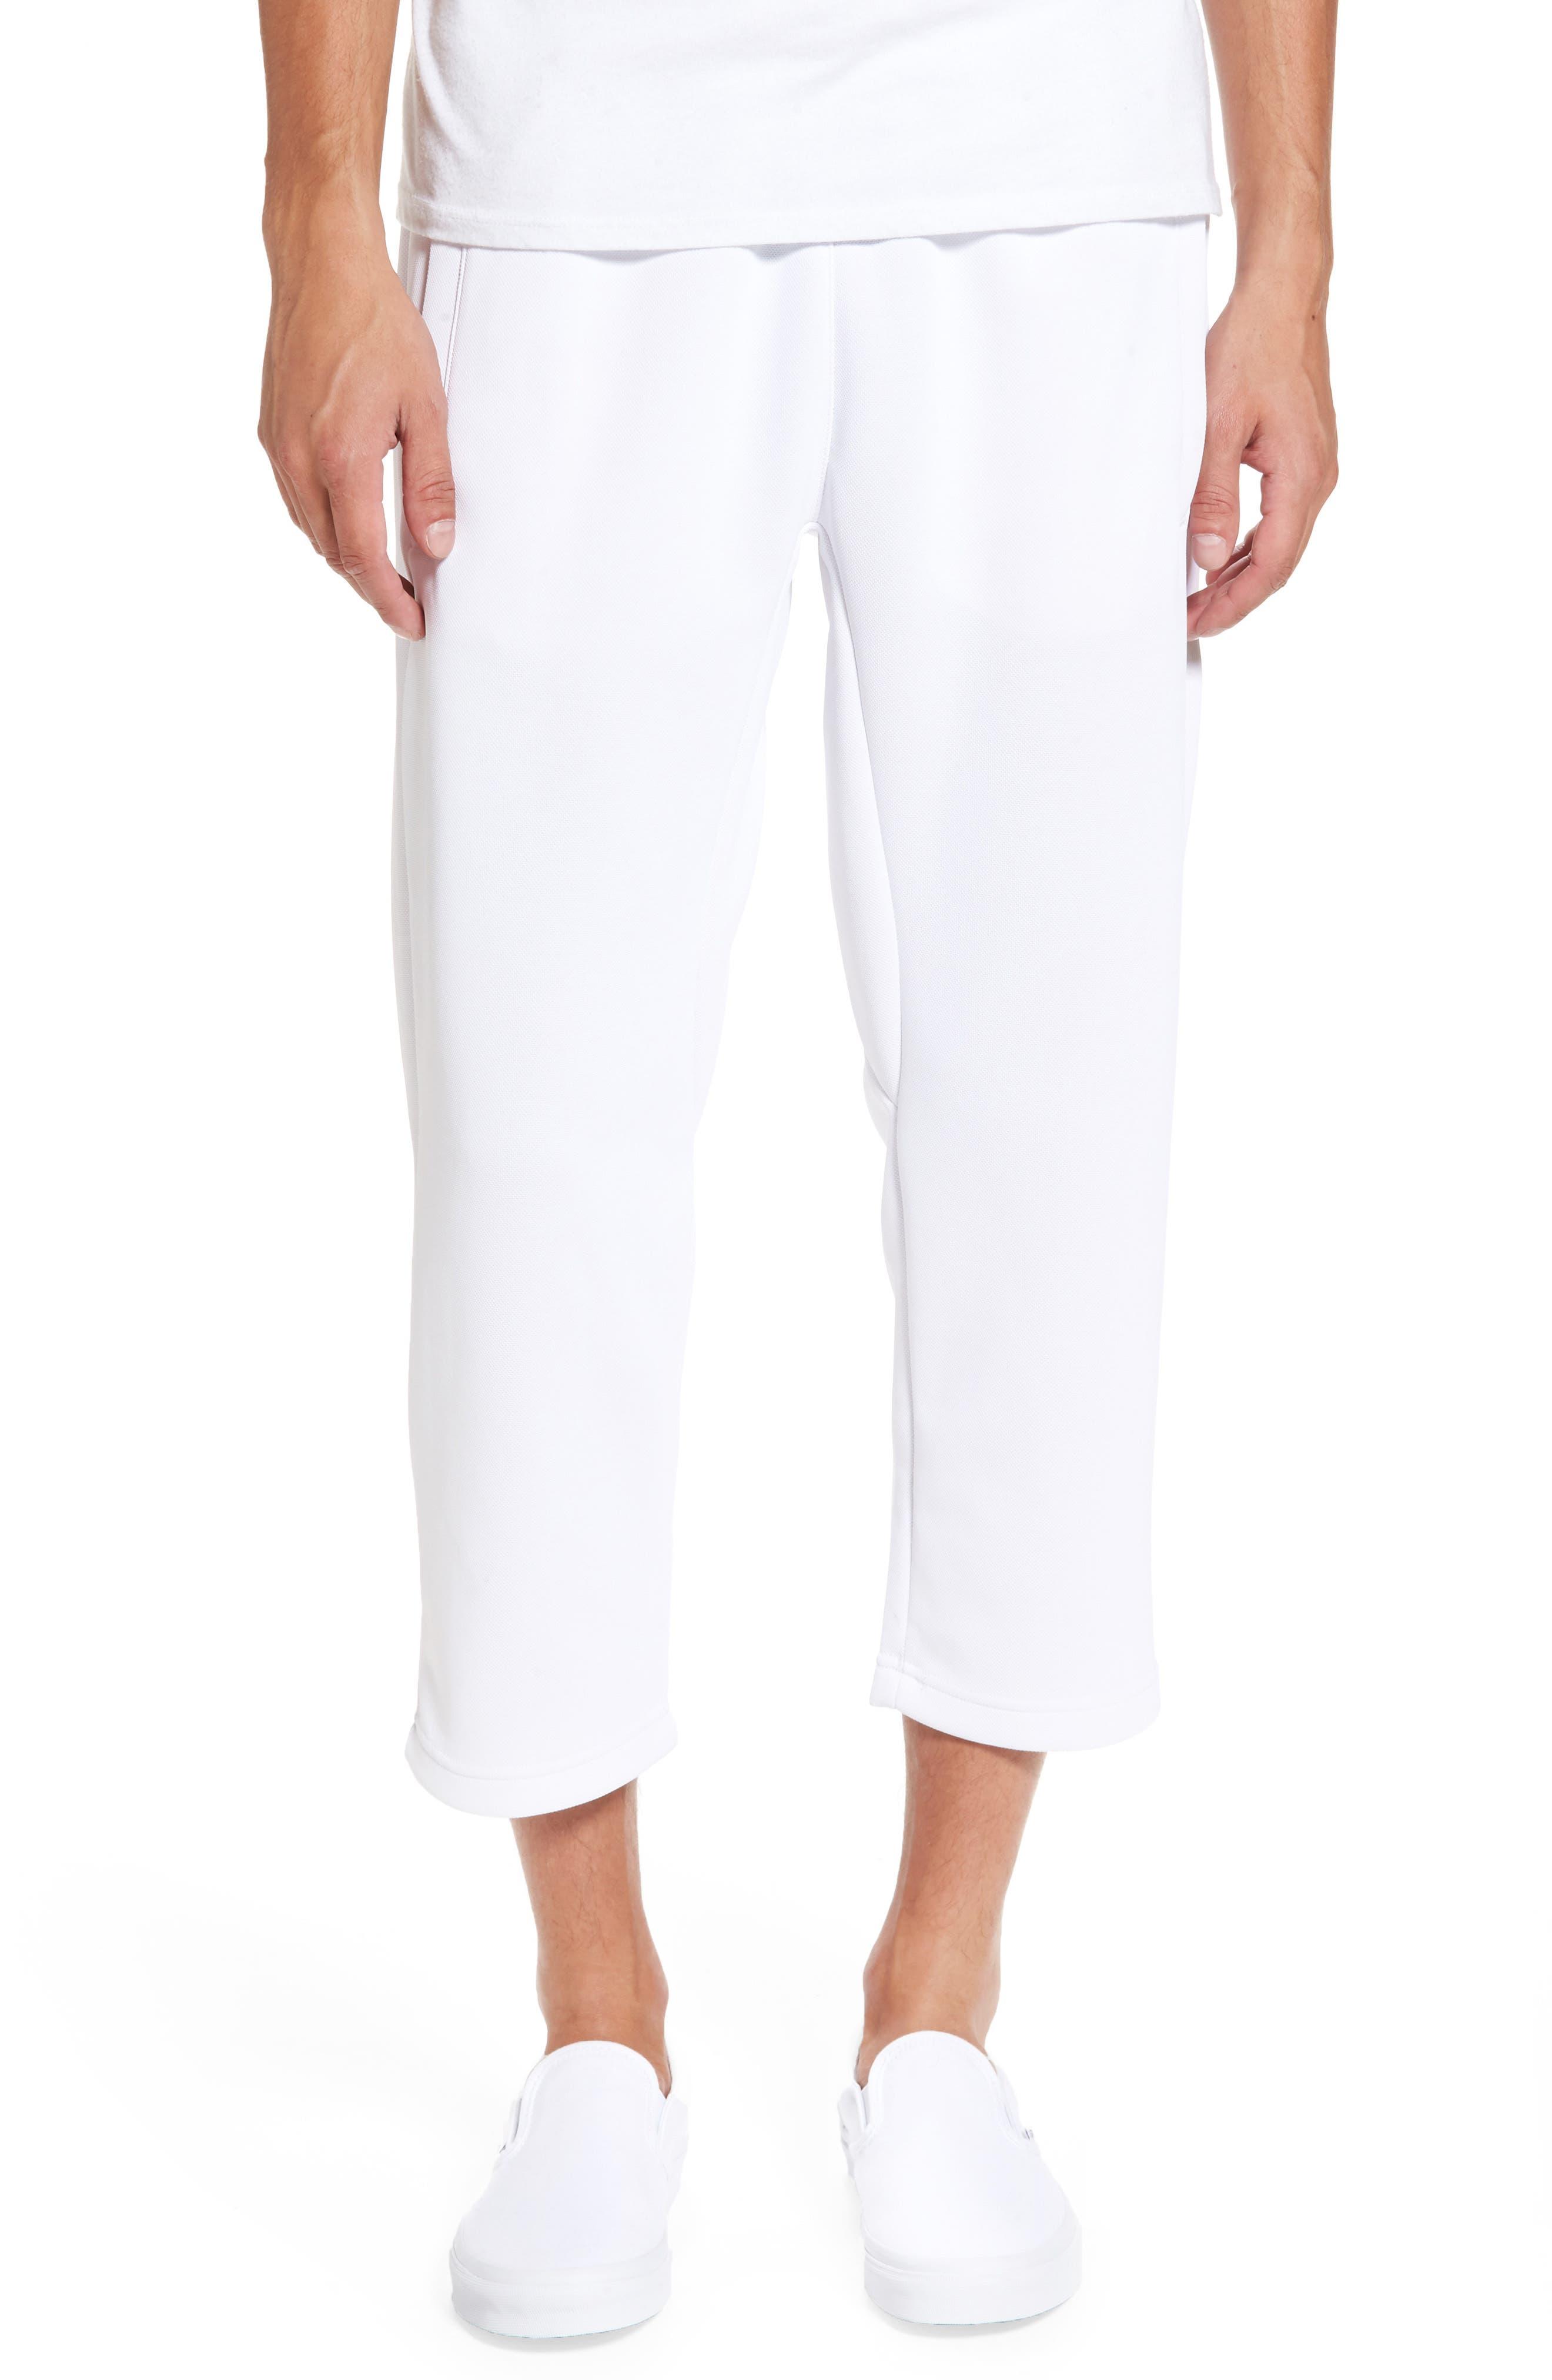 adidas Originals Hawthorne Crop Pants